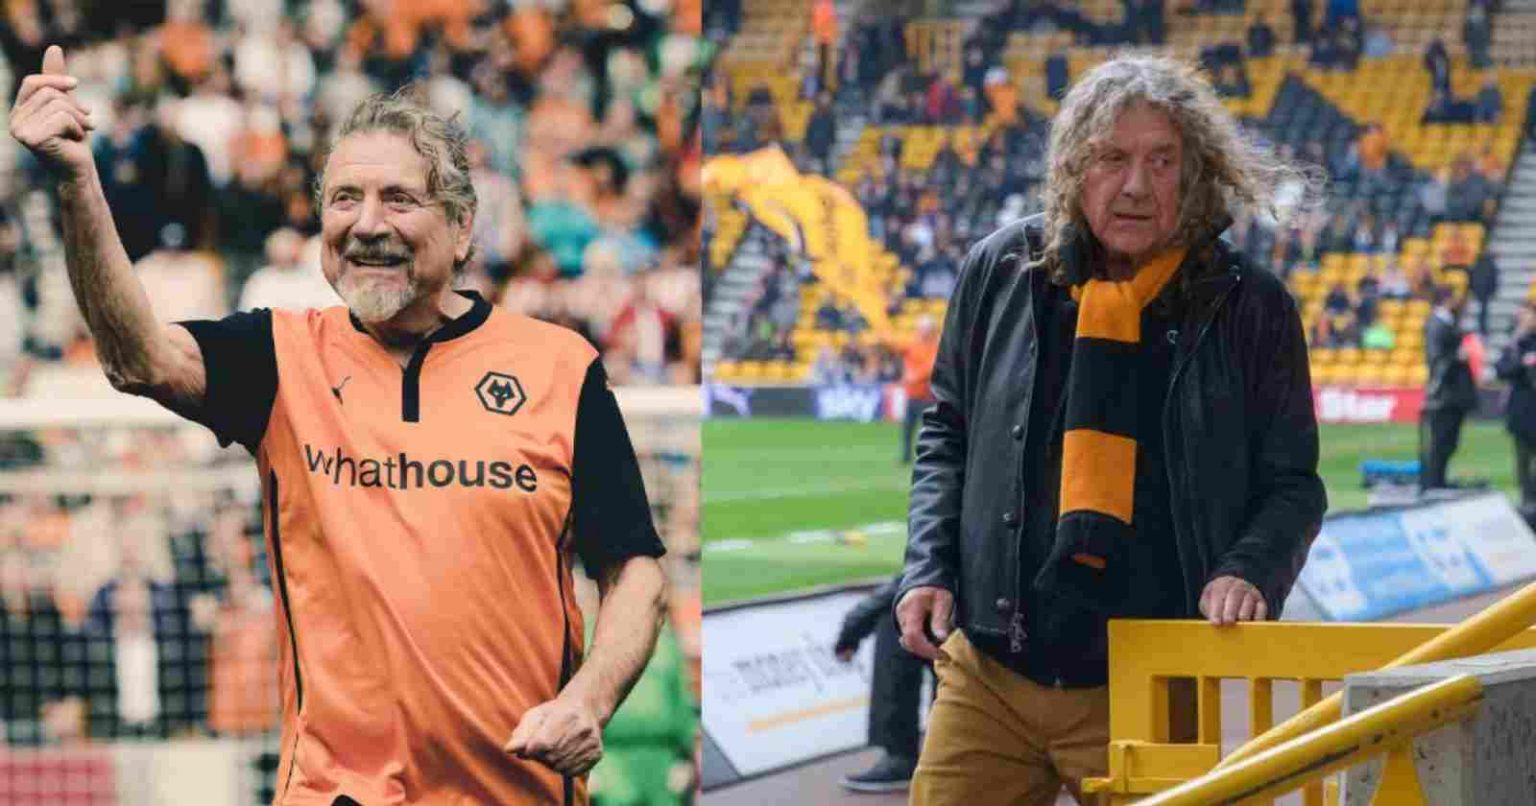 Robert Plant futbol